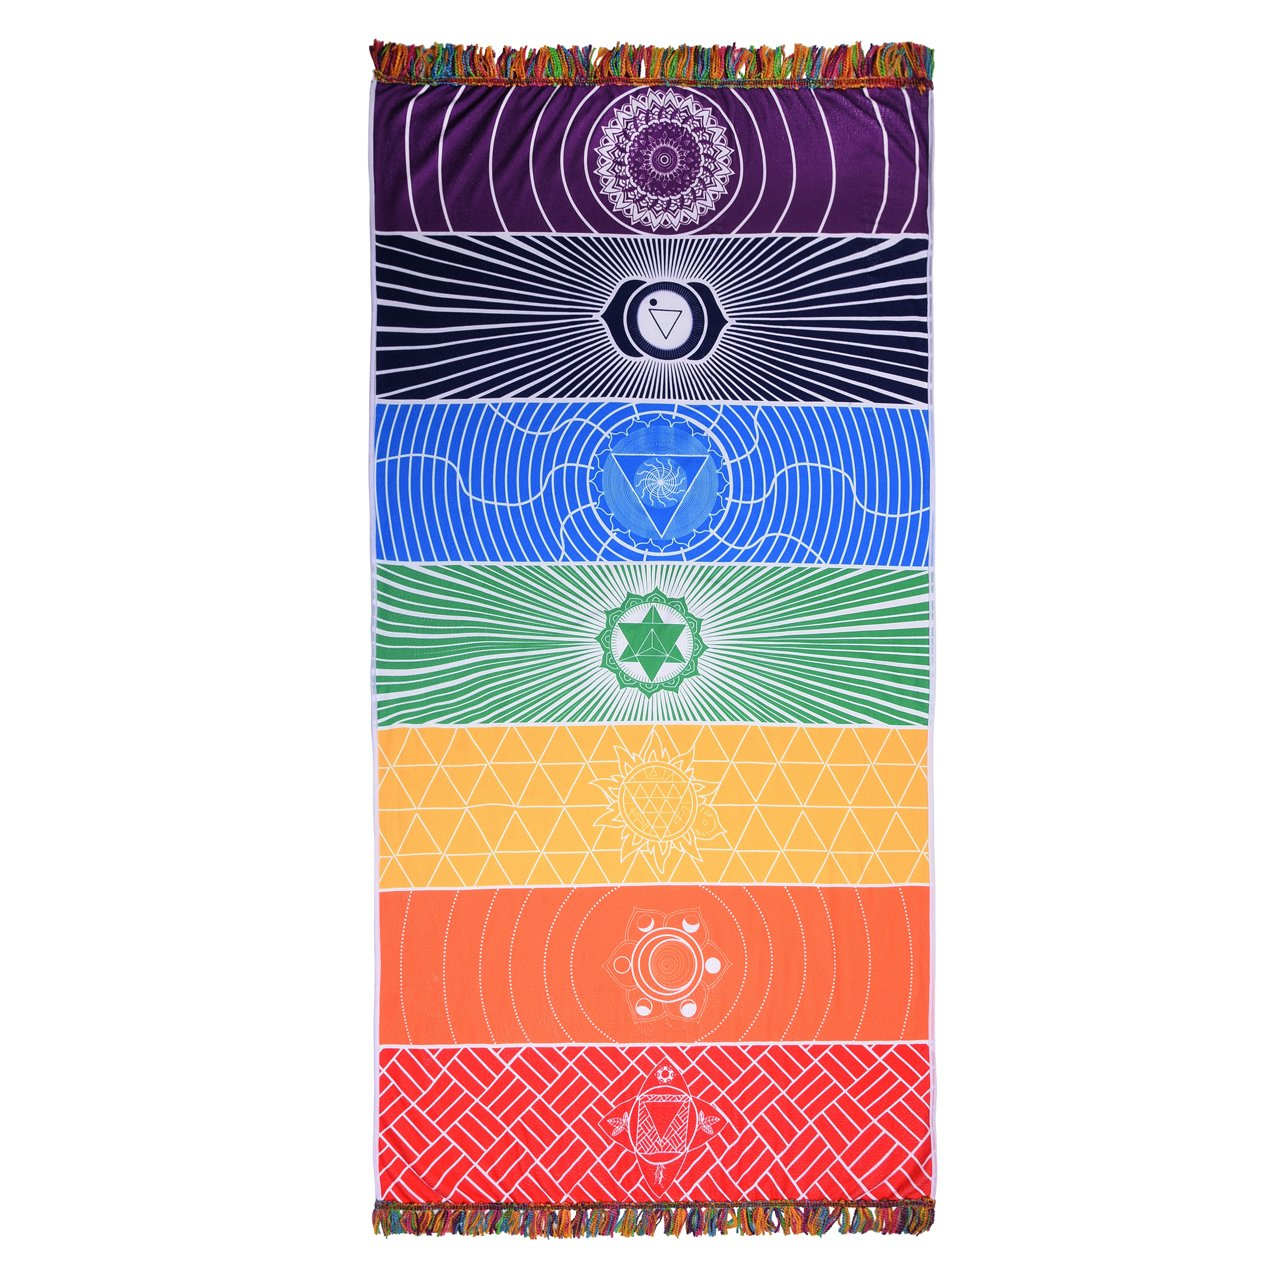 Yoga Towel Chakra: 7 Chakra Tapestry Meditation Yoga Mat